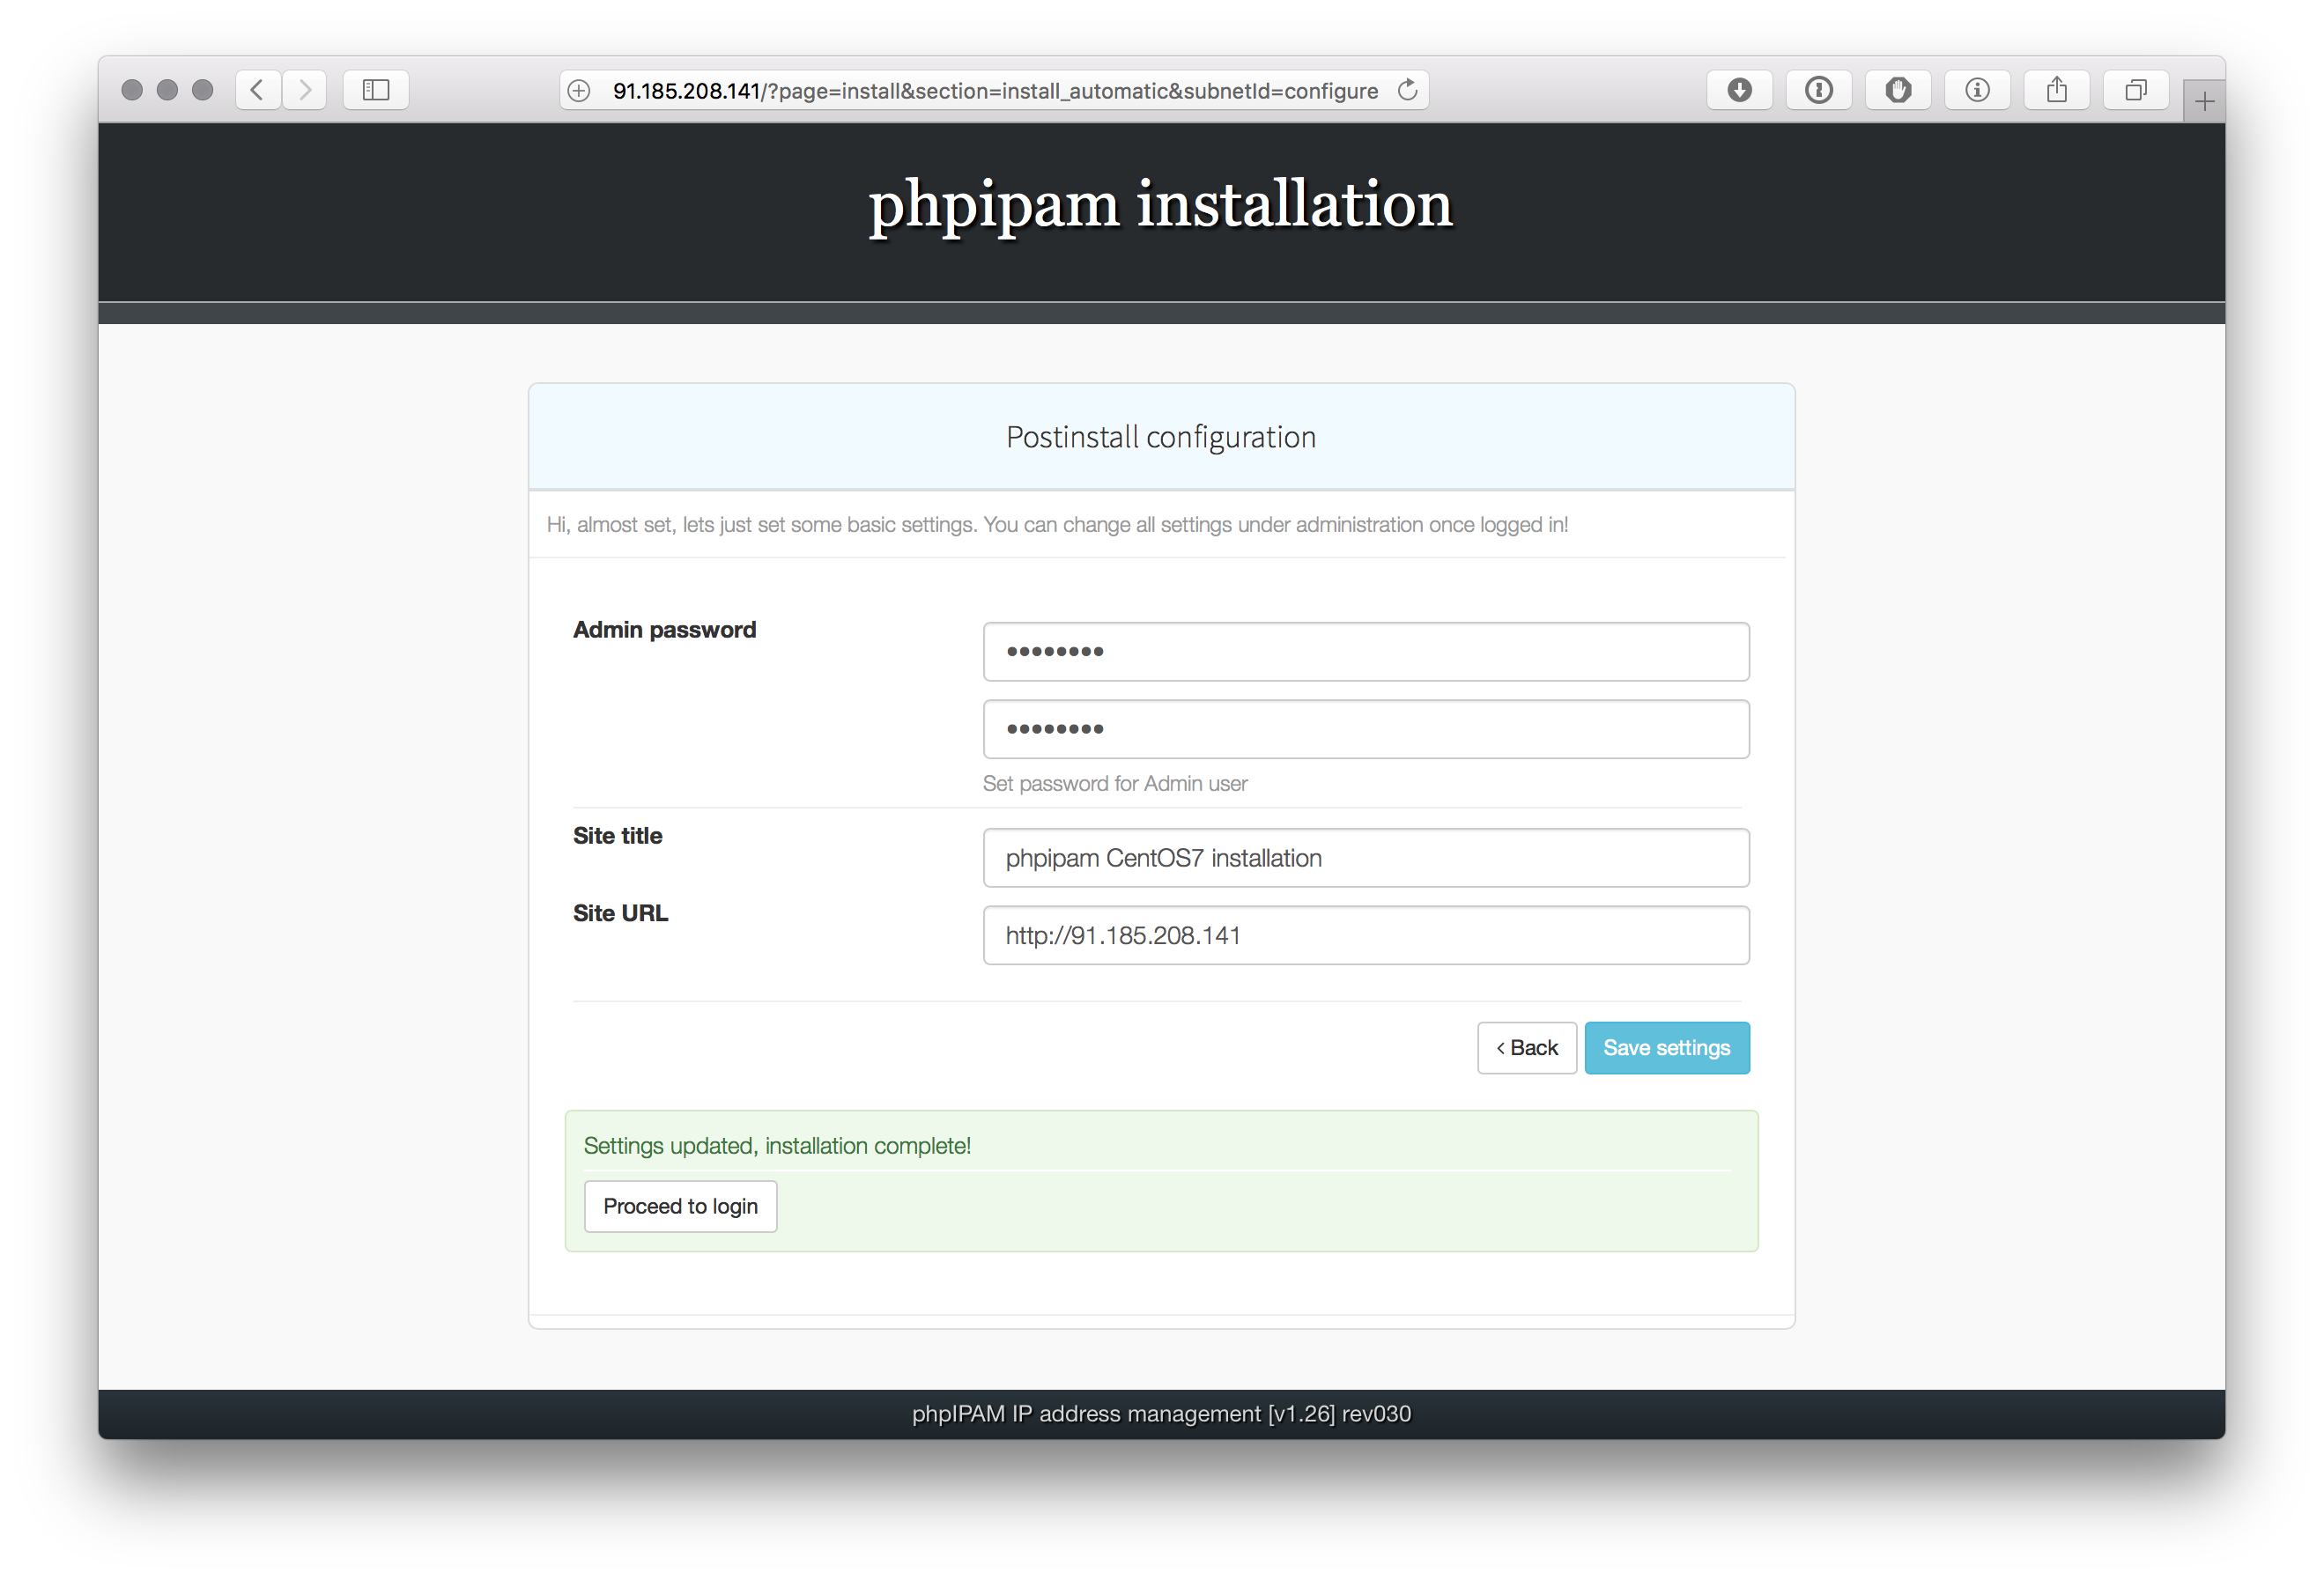 phpIPAM installation on CentOS 7